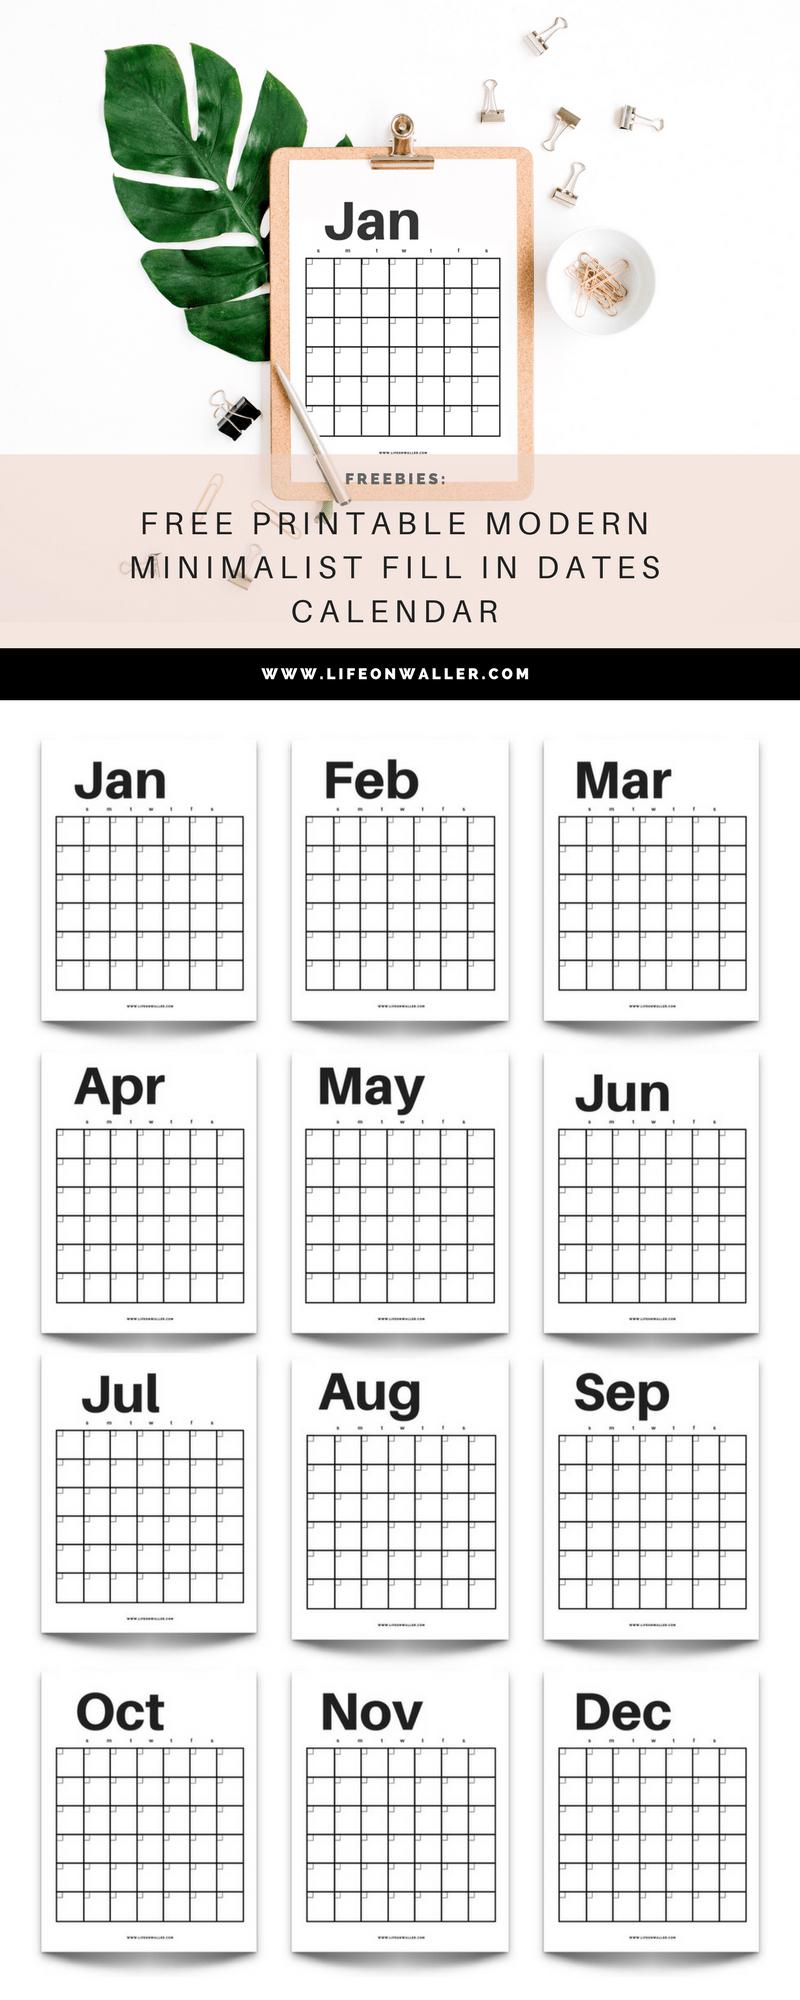 Free Printable Modern Minimalist Fill In Calendar - Use